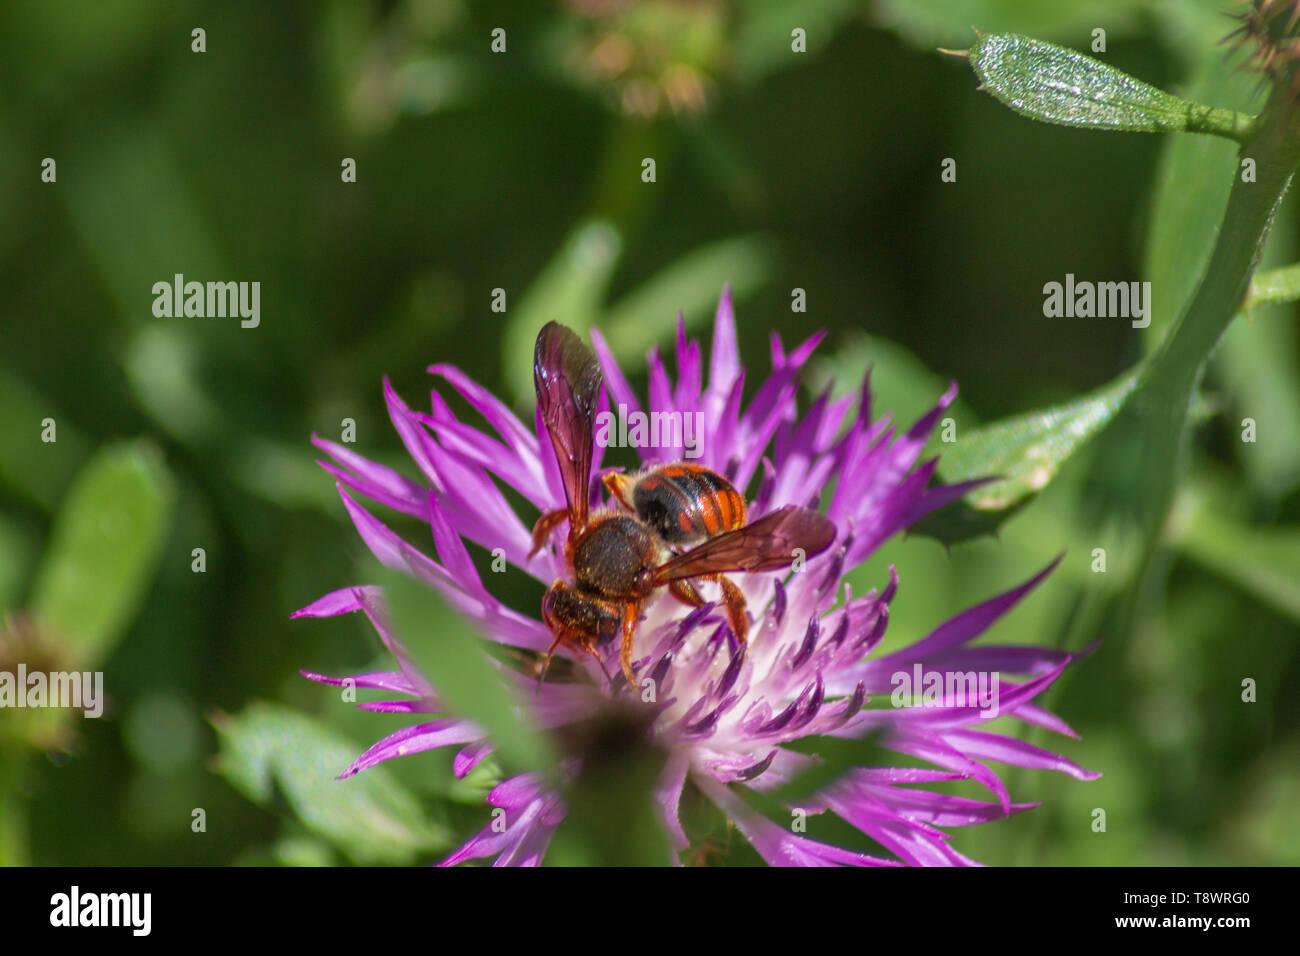 Rhodanthidium sticticum Bee feeding on a Knapweed plant Centaurea - Stock Image